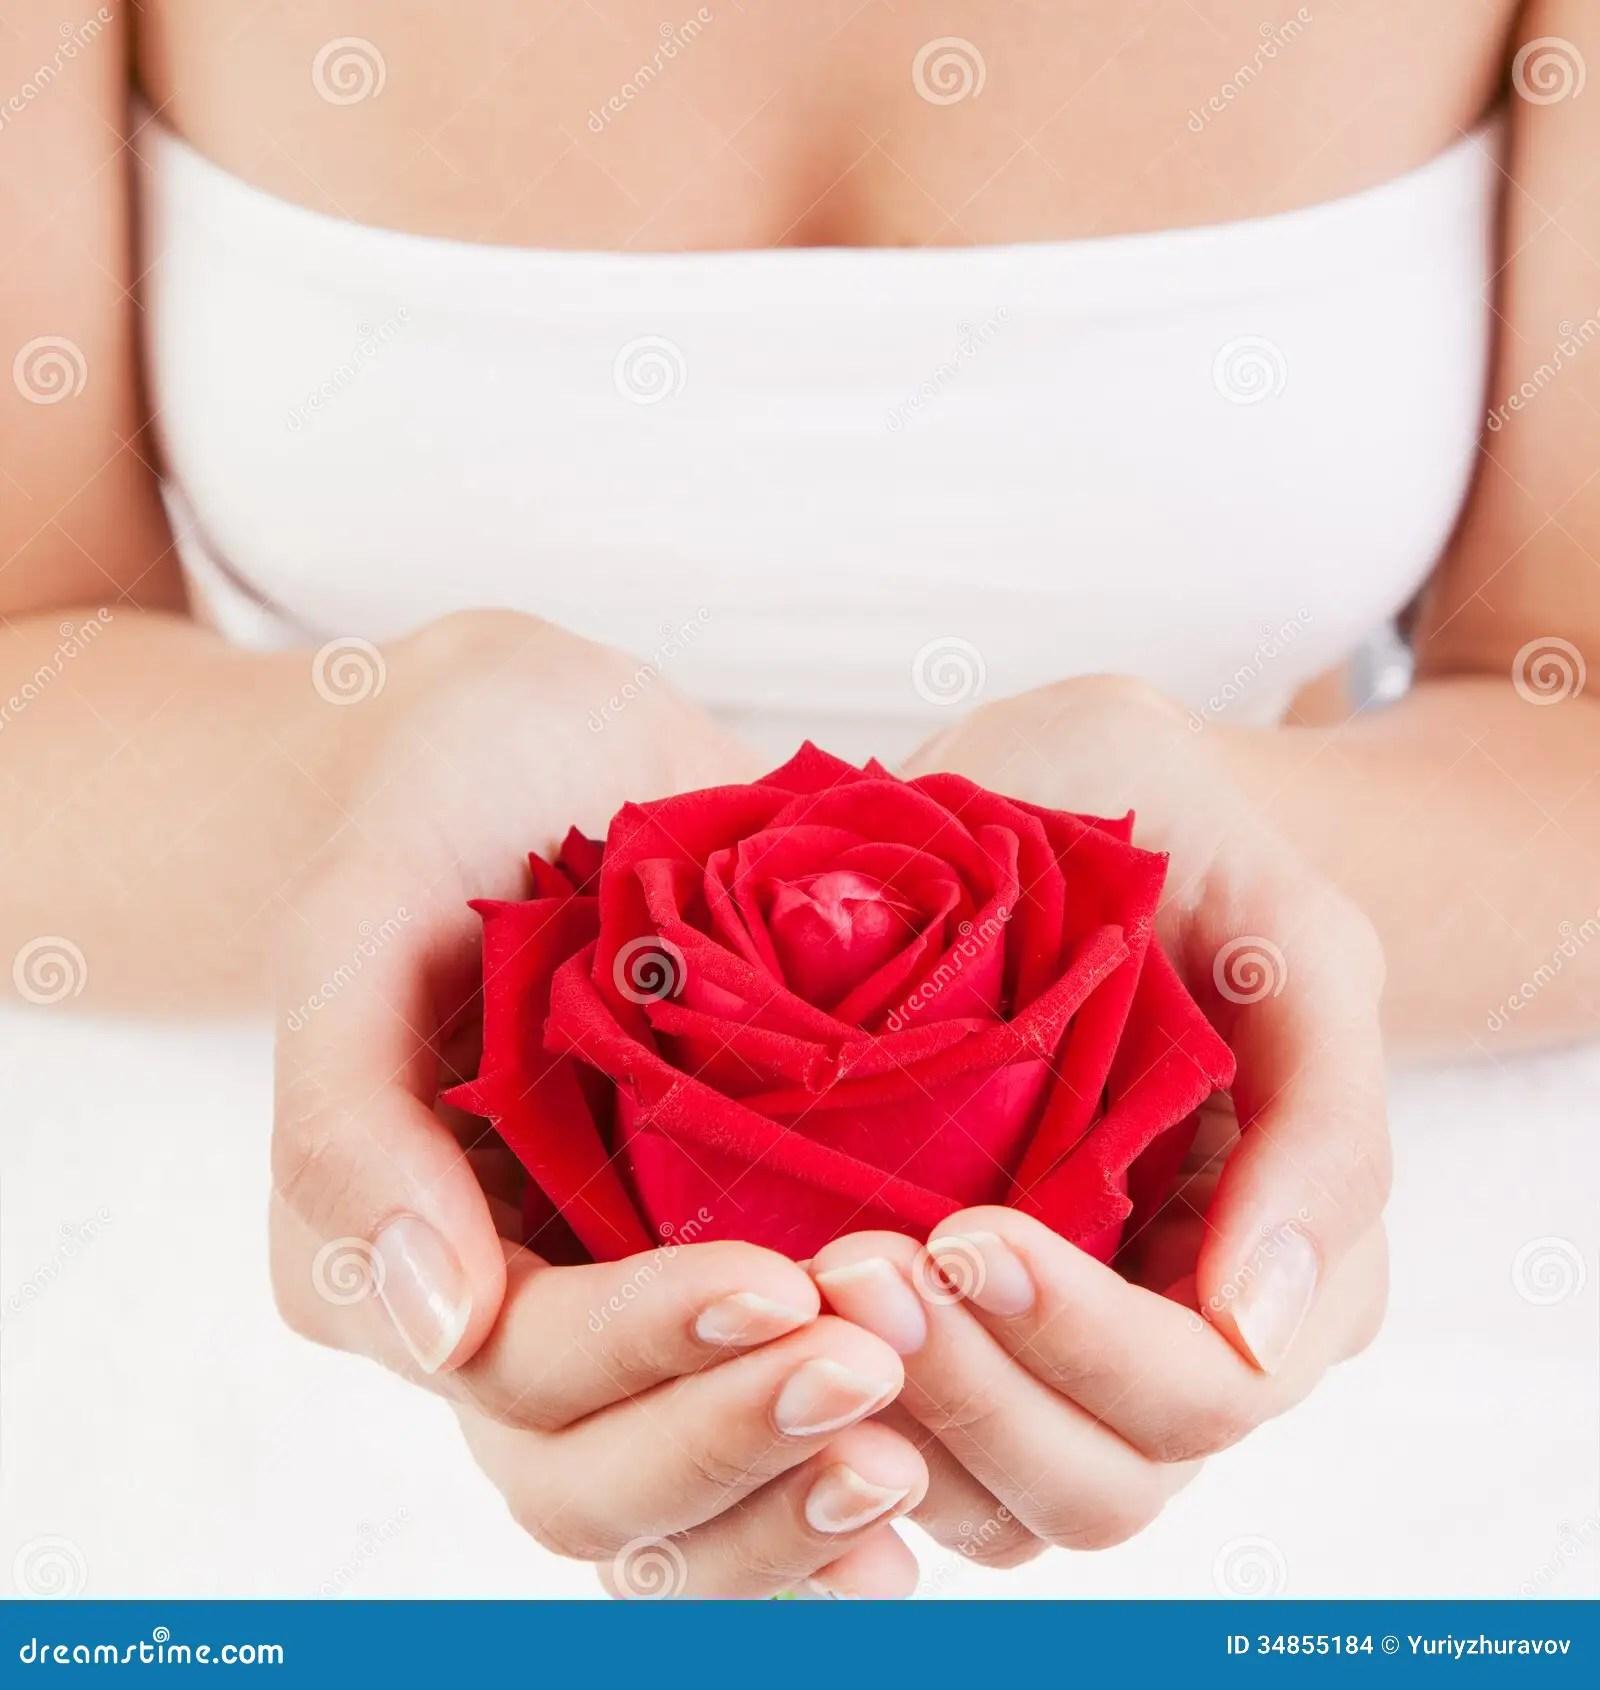 Holding Both Hands Rose